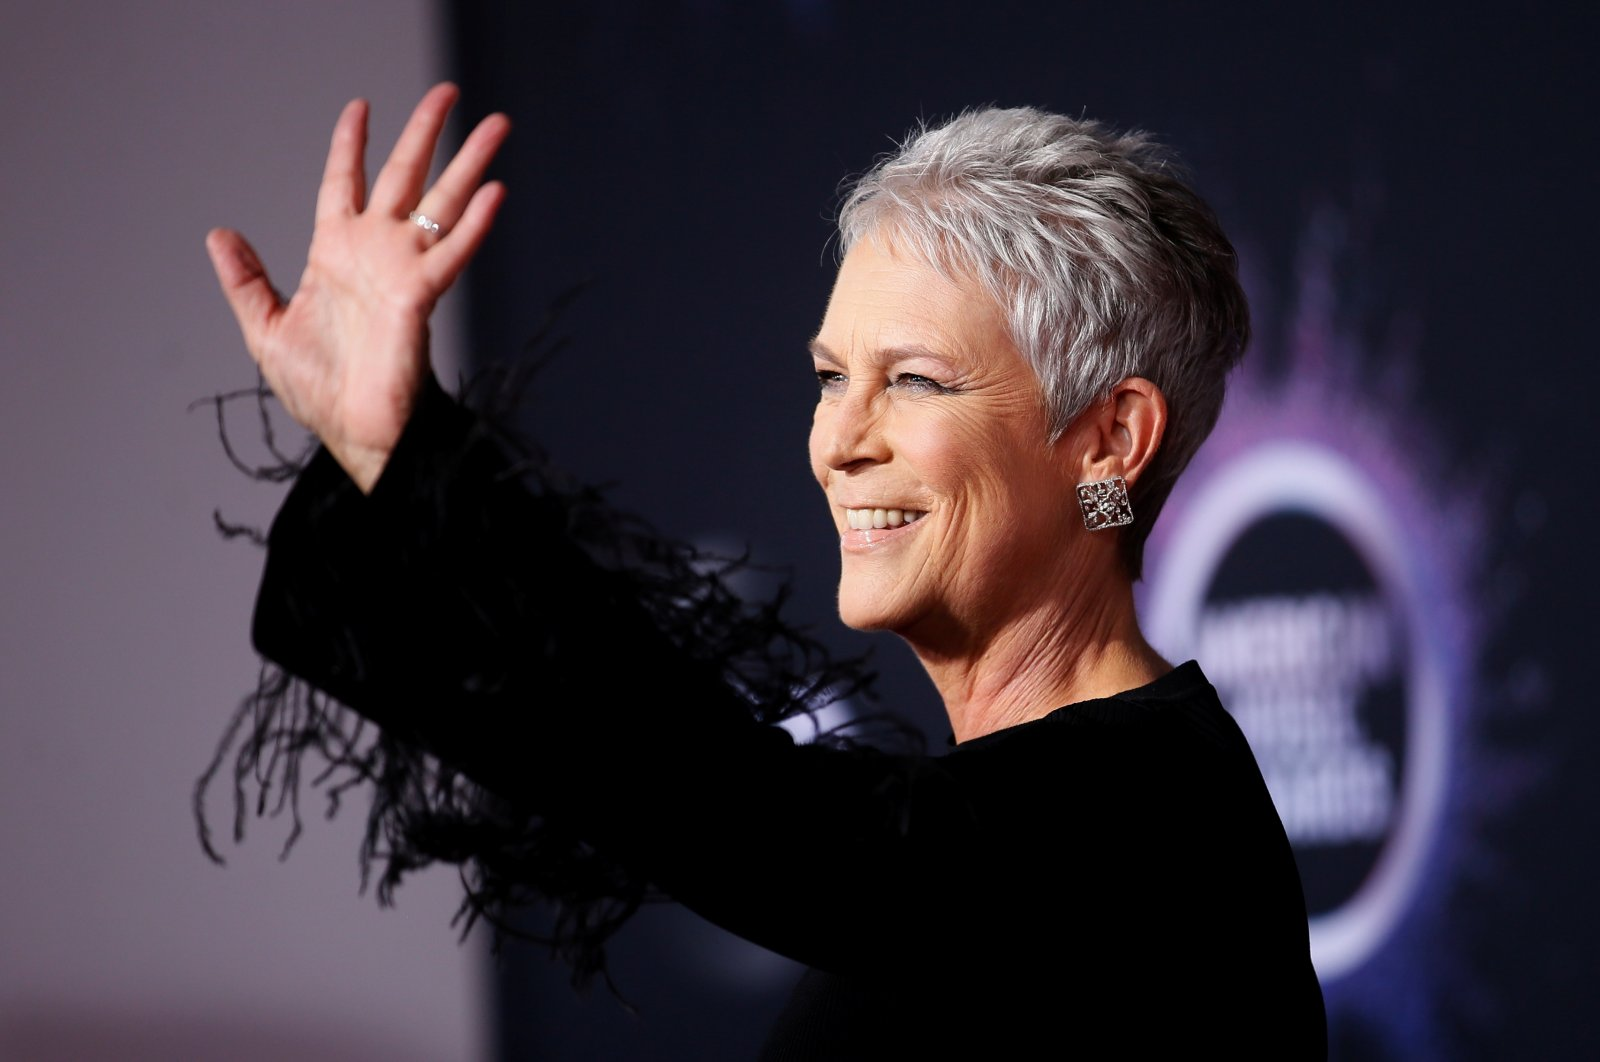 Jamie Lee Curtis arrives at the American Music Awards in Los Angeles, California, U.S., Nov. 24, 2019. (Reuters Photo)